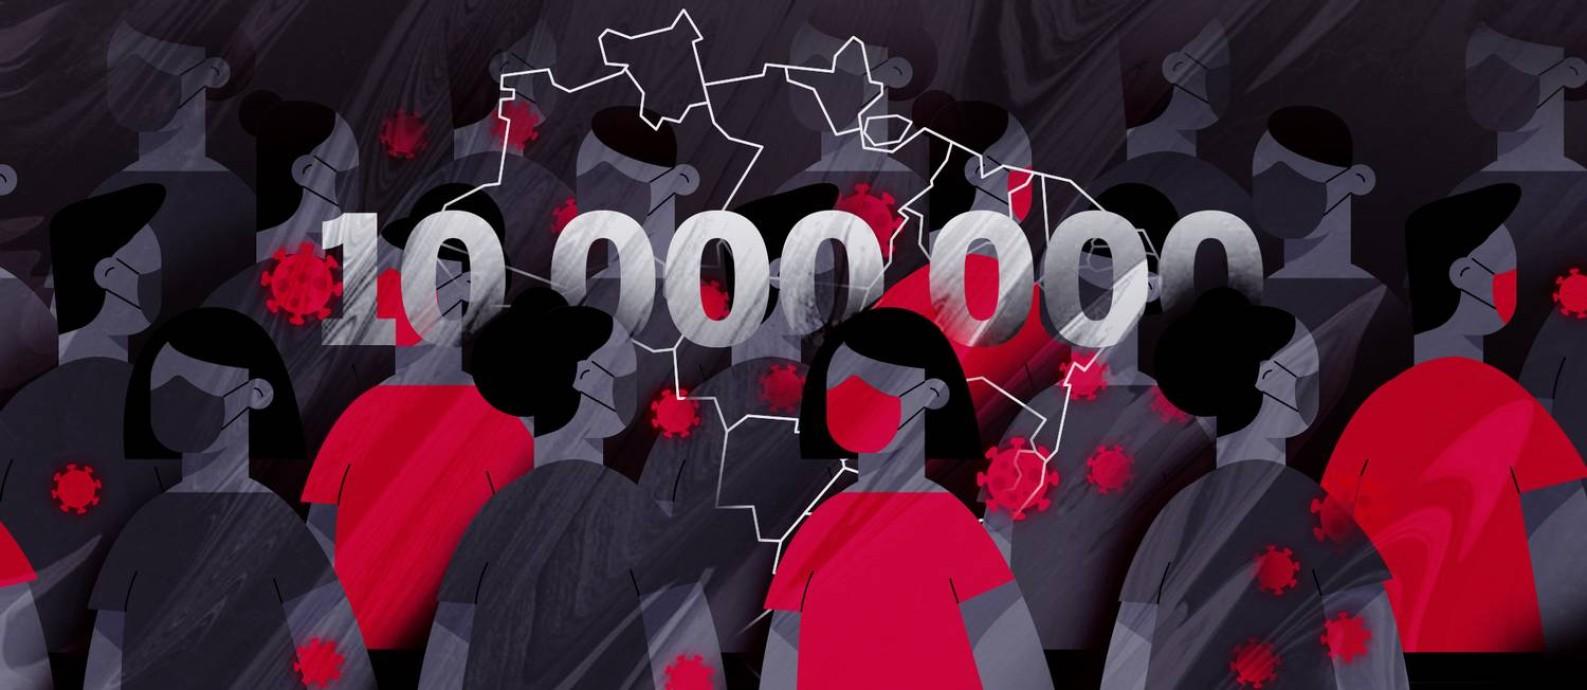 Brasil ultrapassa 10 milhões de casos de Covid-19 Foto: Editoria de Arte